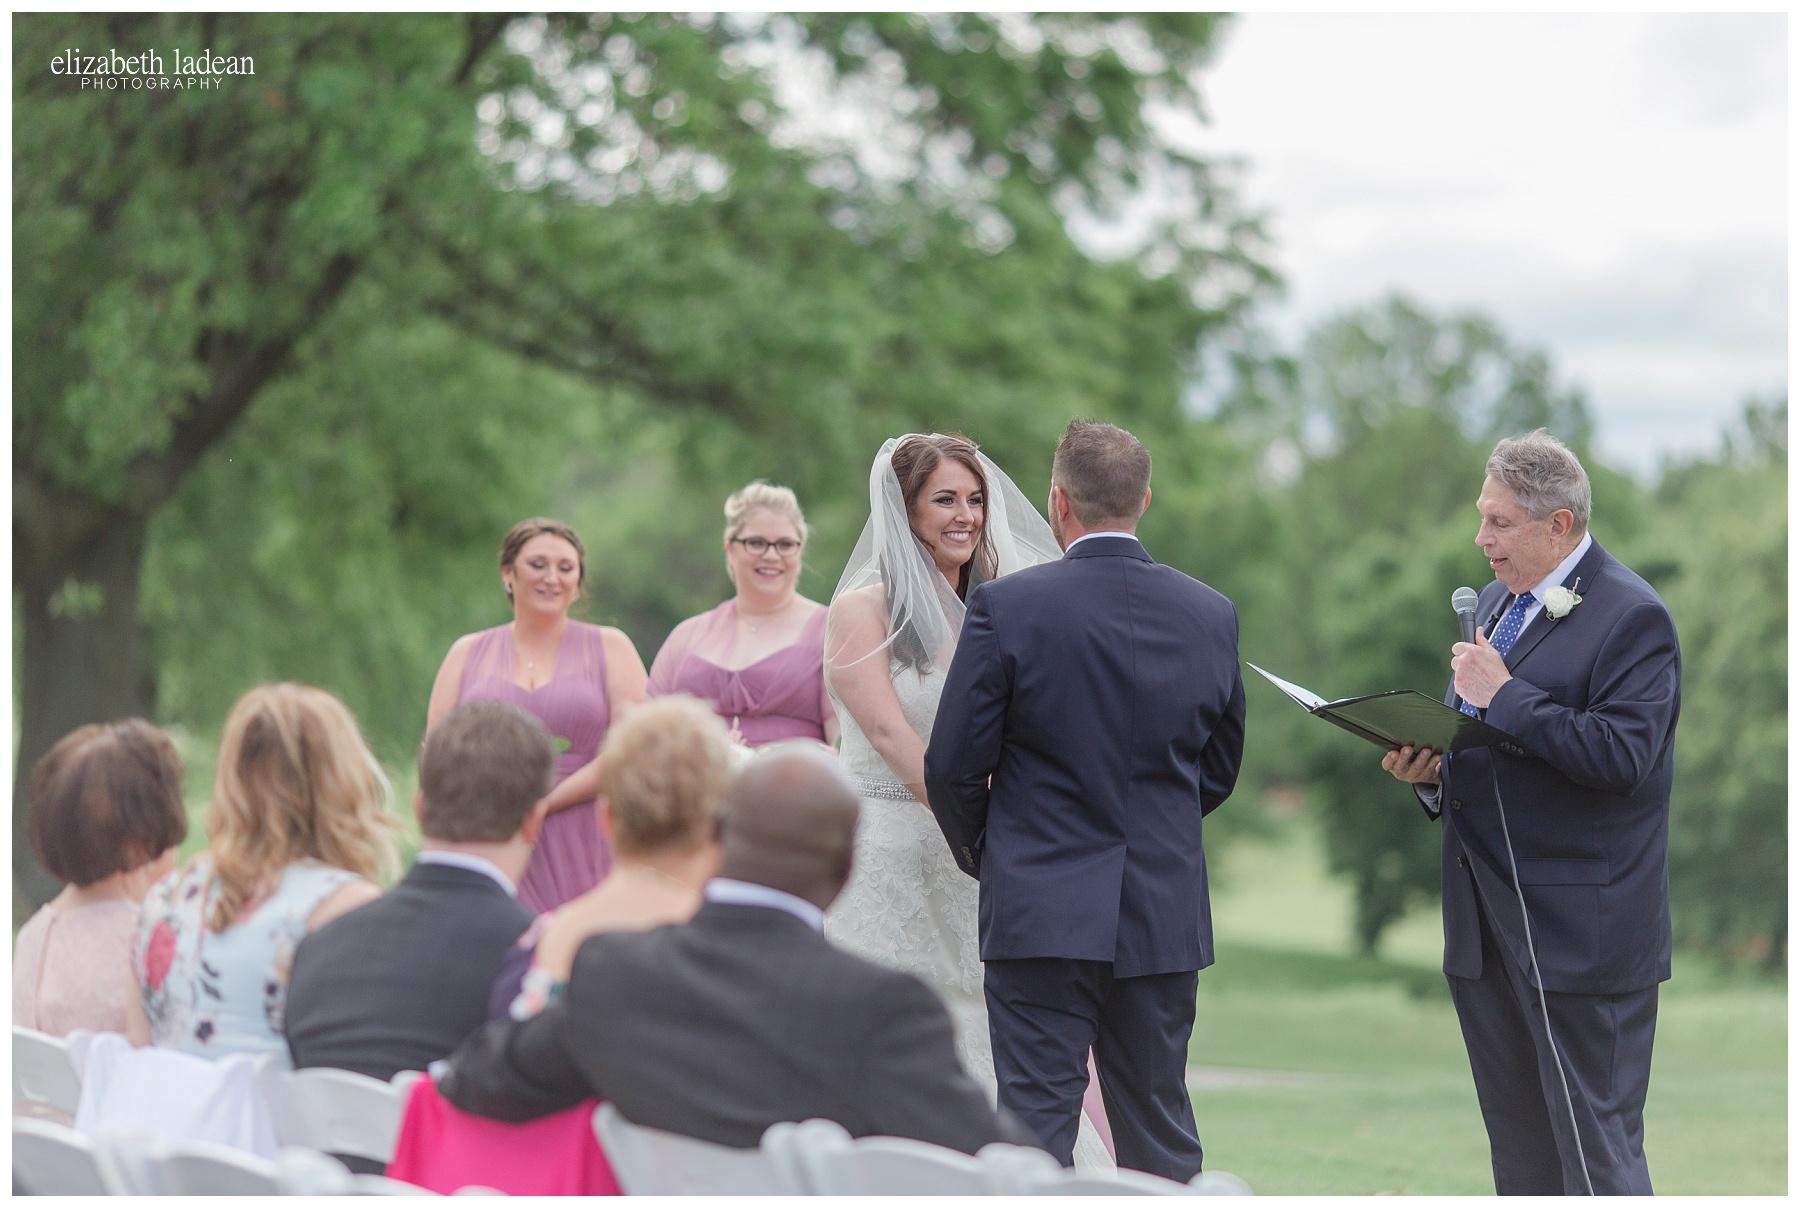 Hillcrest-Country-Club-Kansas-City-Wedding-Photography-E+J-0520-Elizabeth-Ladean-Photography-photo_0841.jpg